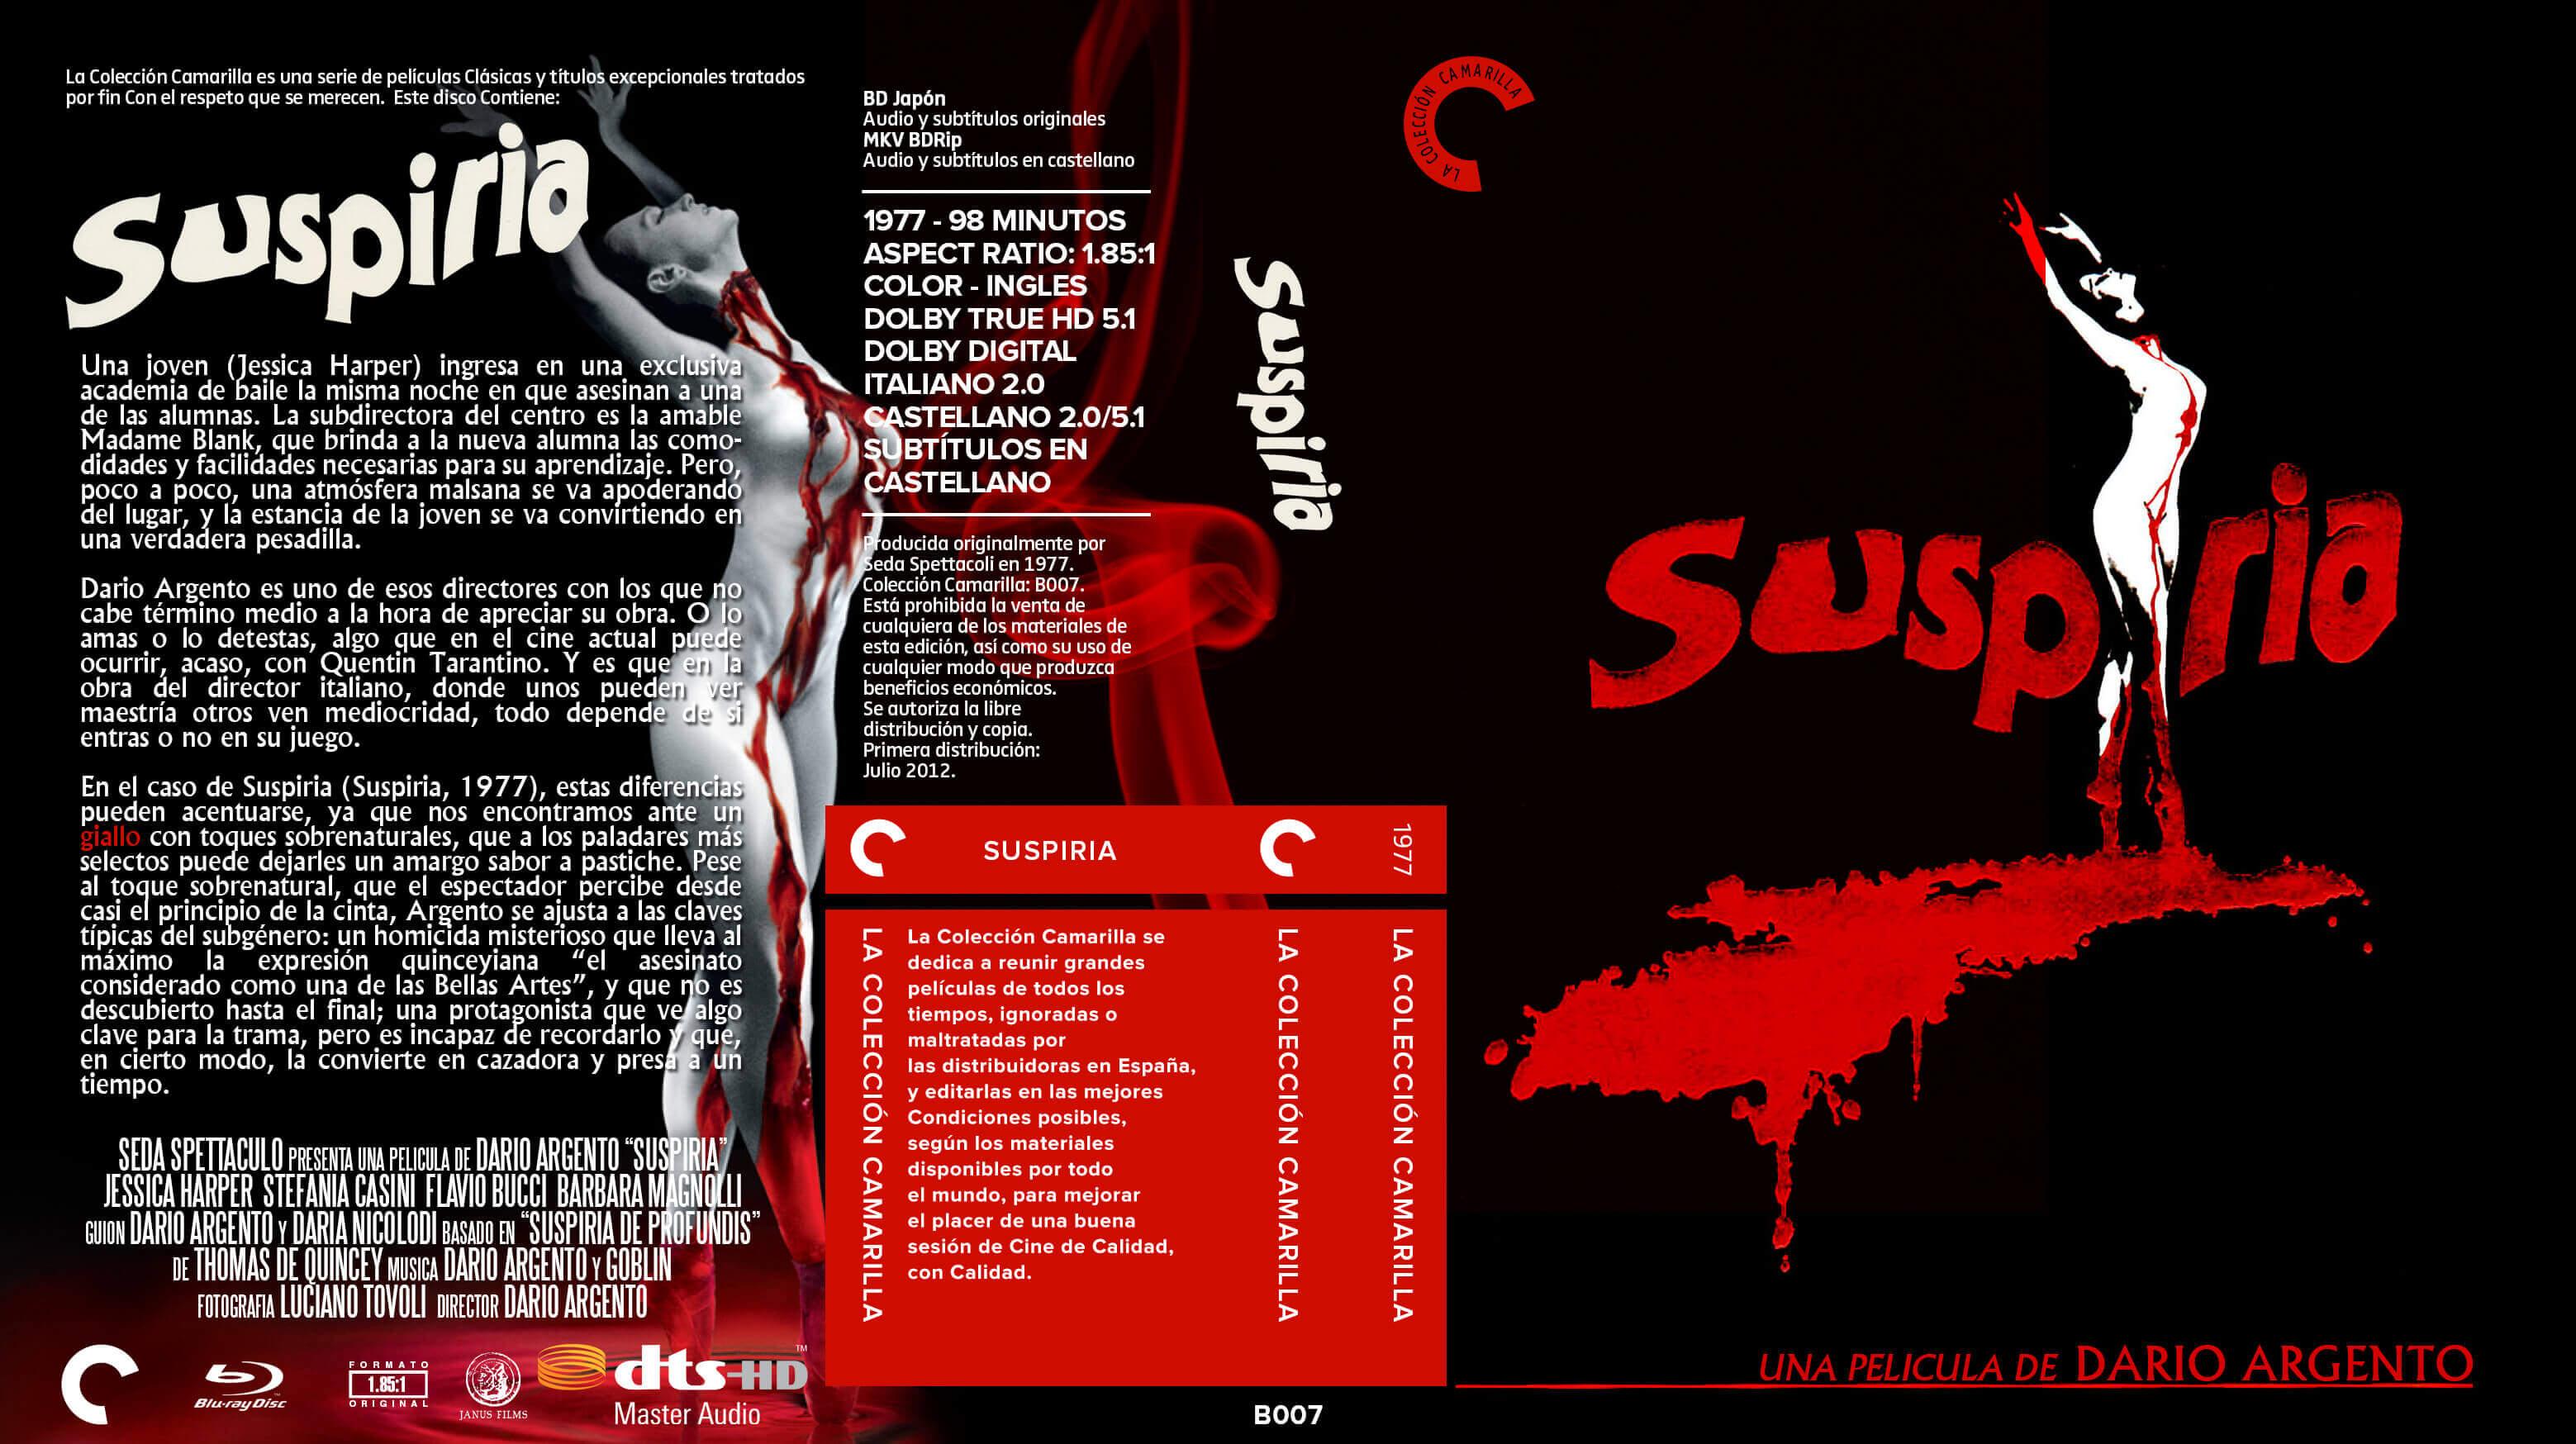 suspiria - top horror movies